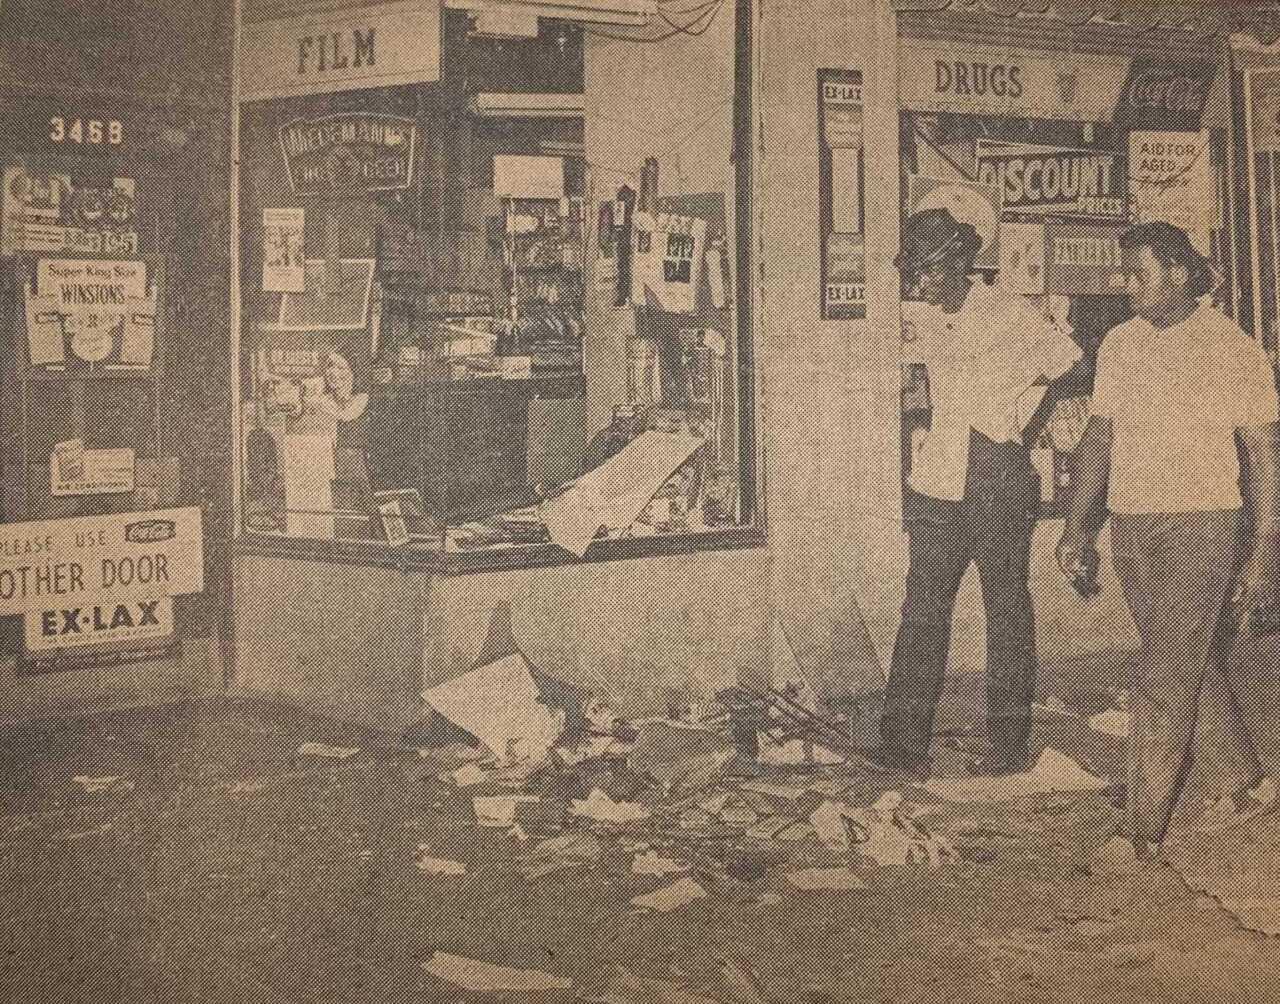 Bob Stigers Men Walking through the destruction in front of Torfs.jpeg